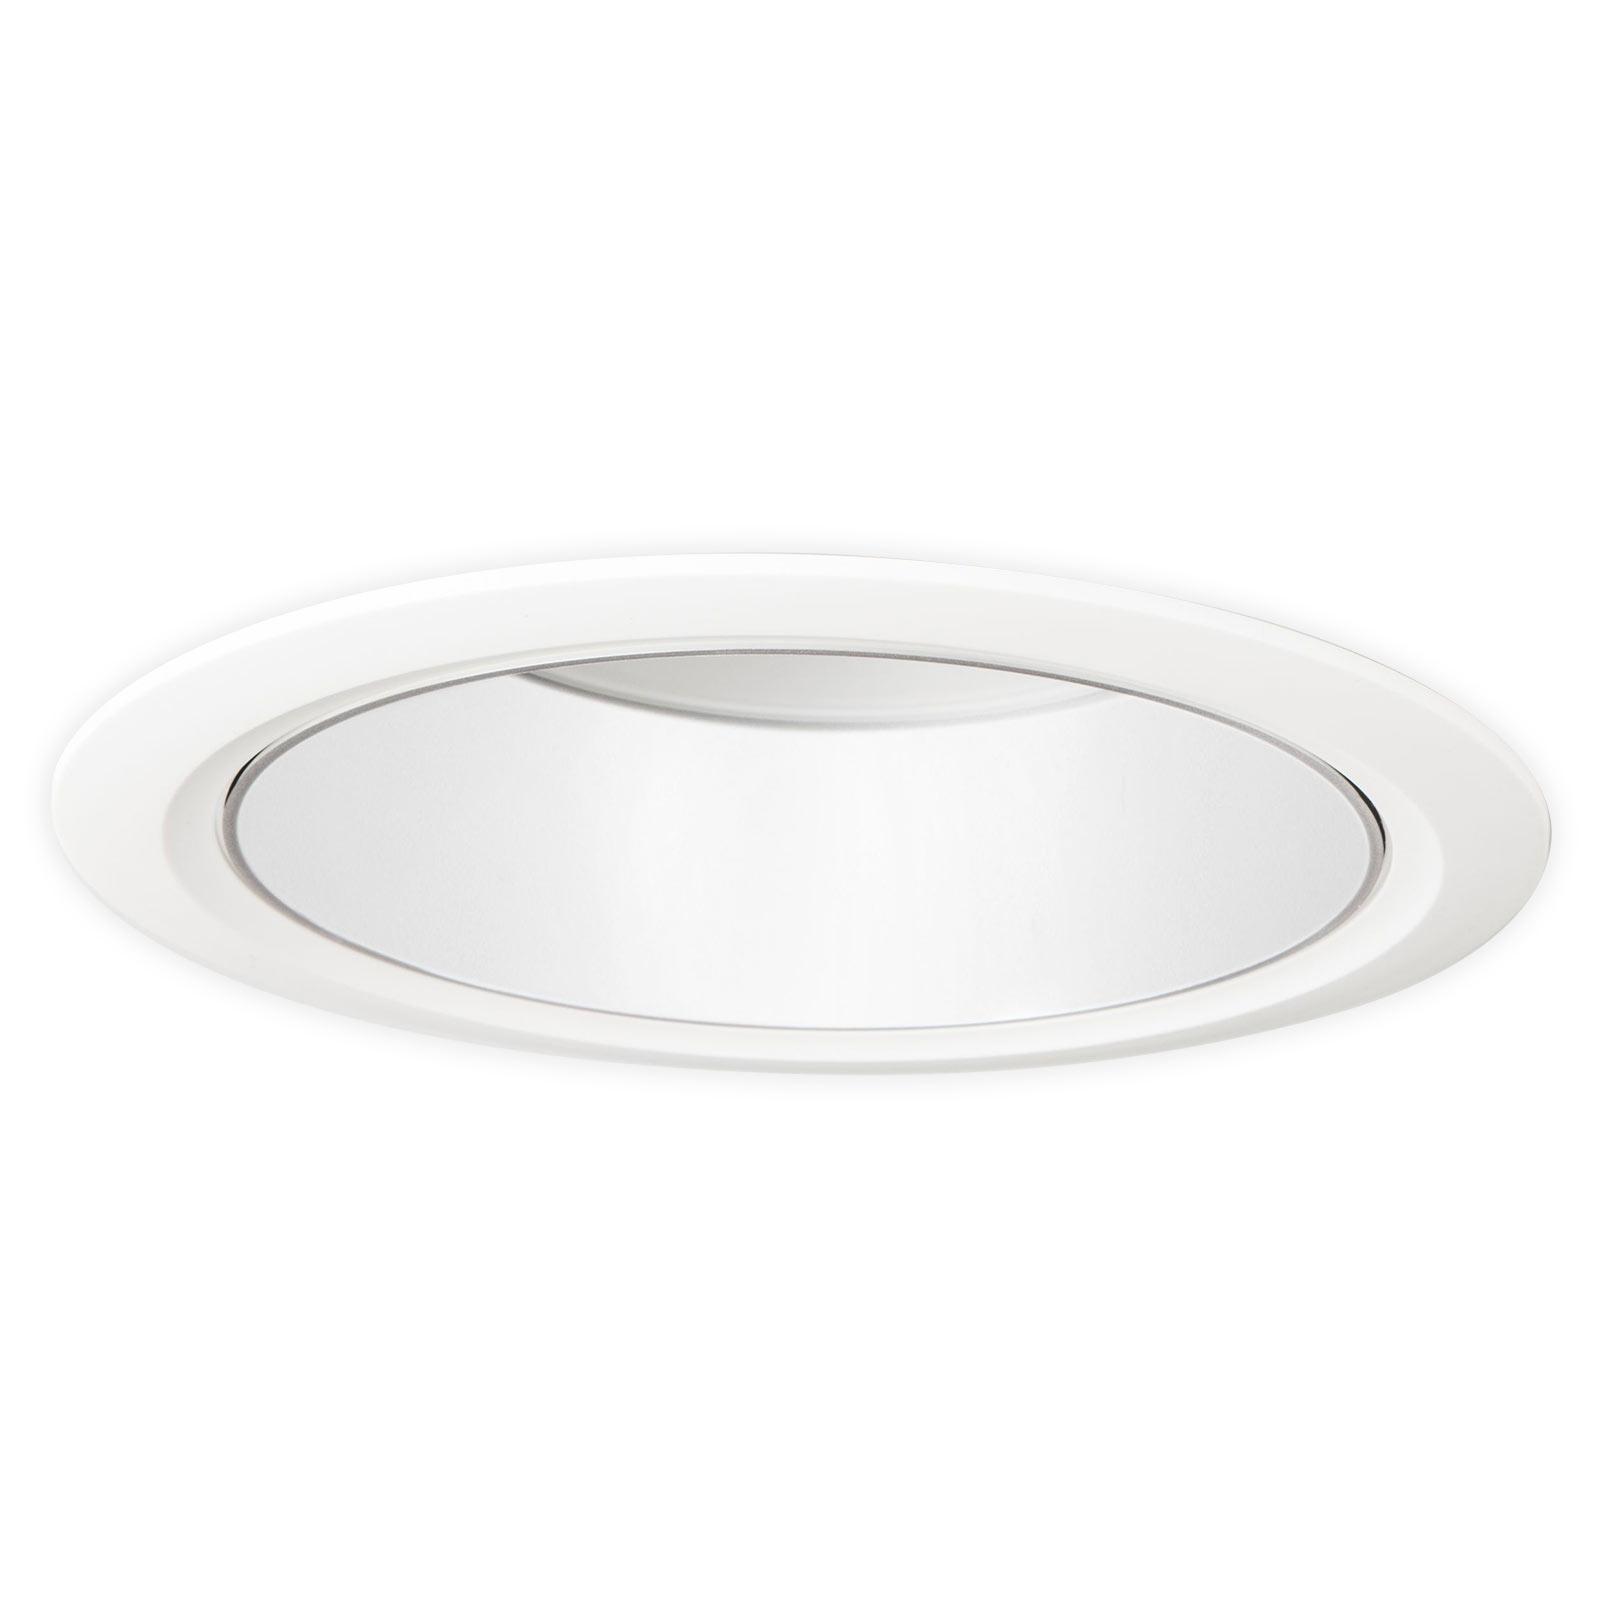 LED-Downlight D70-RF155 HF 4.000K weiß/weiß